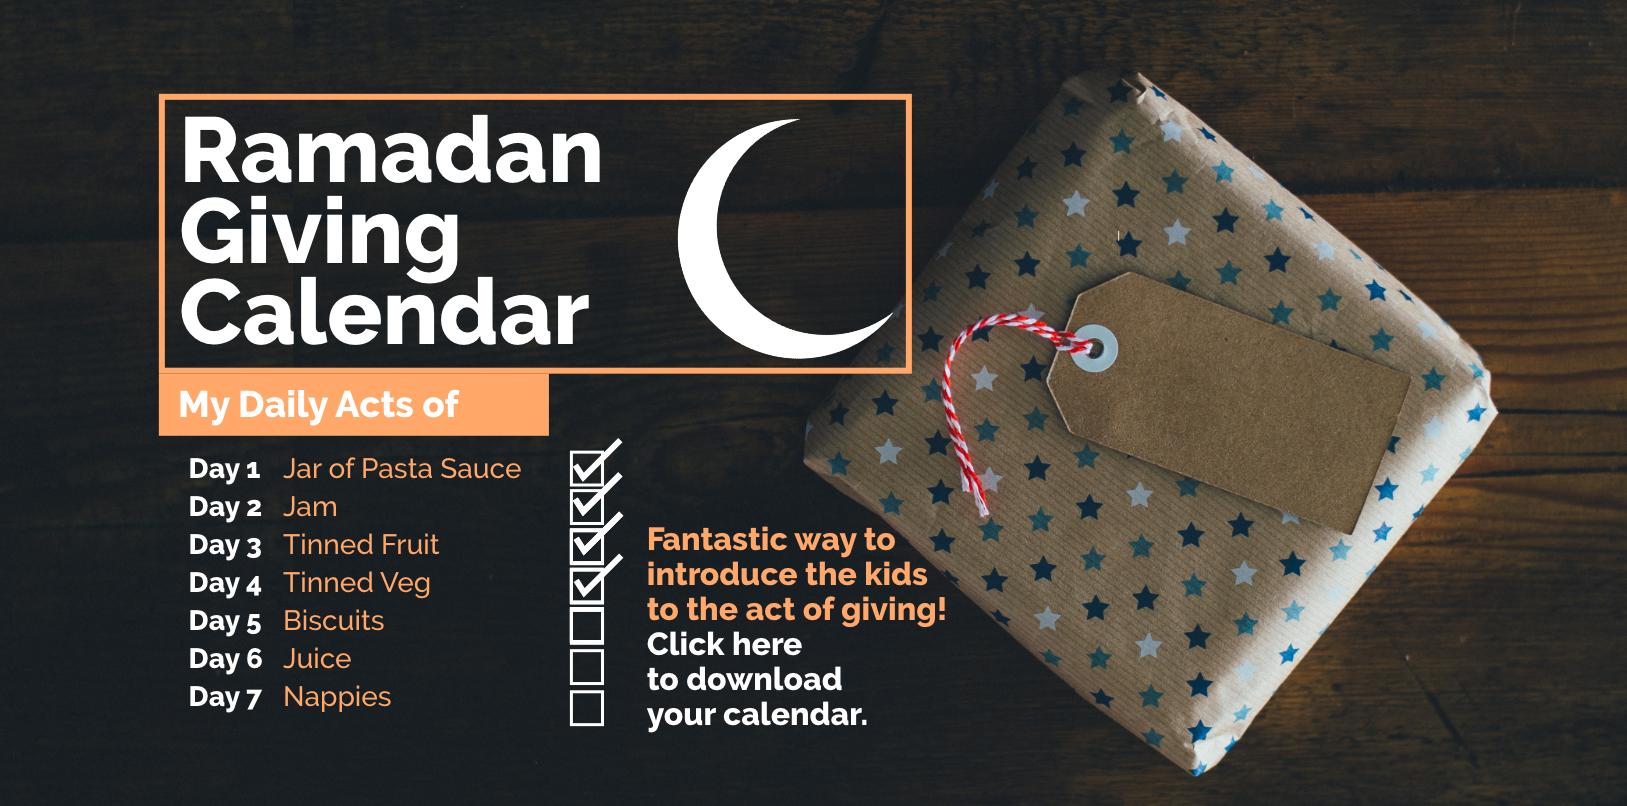 Ramadan Giving Calendar 2019